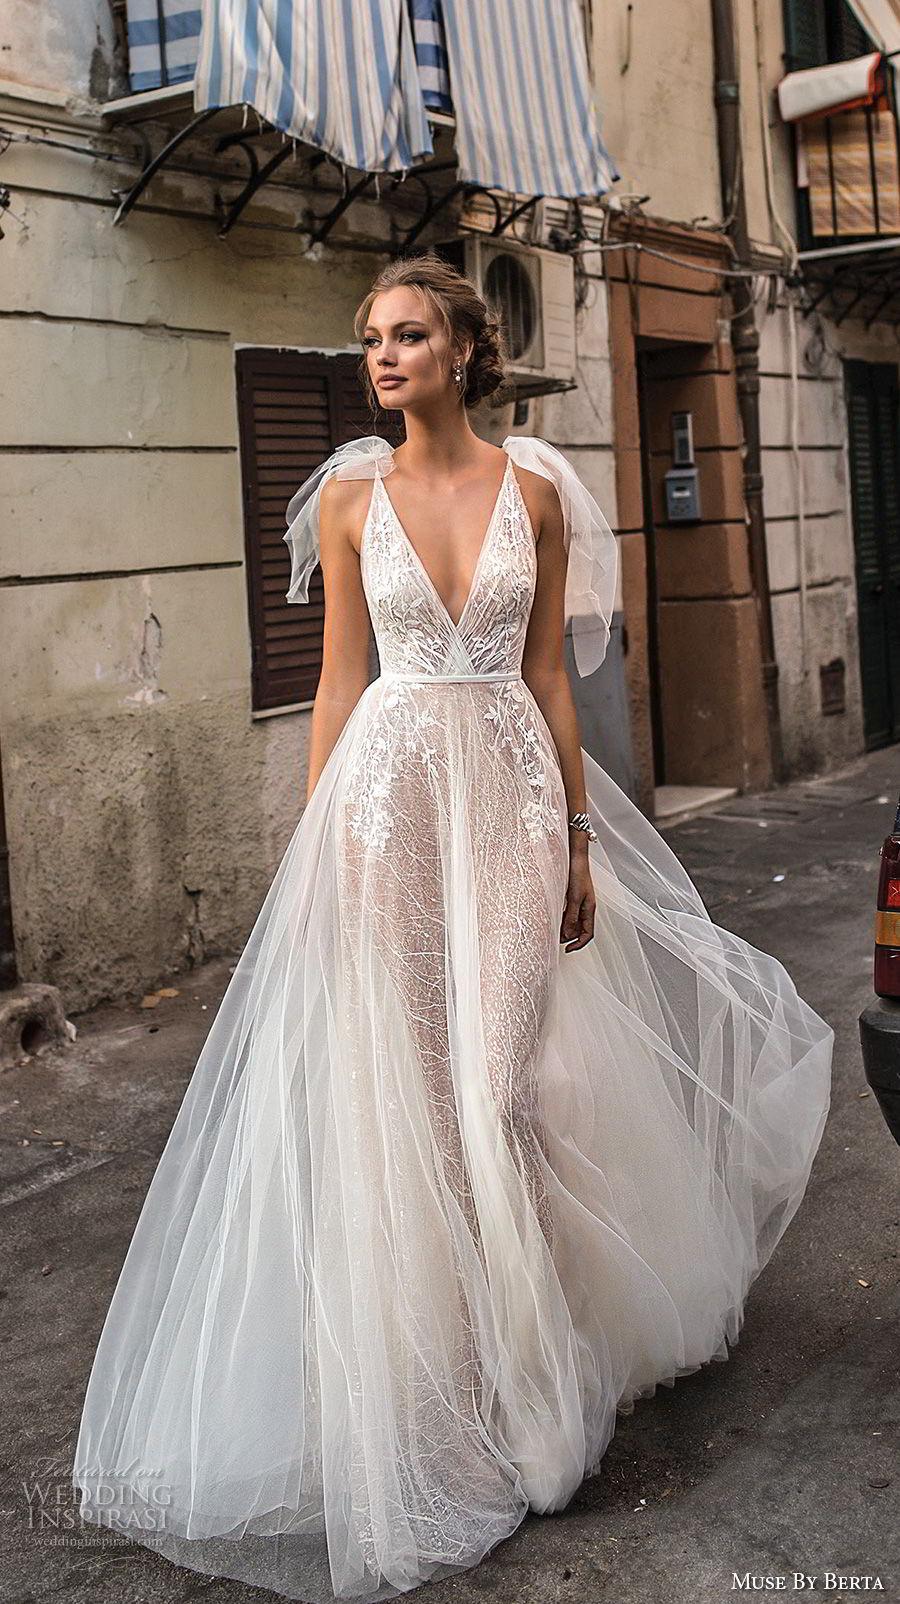 muse-berta-2018-bridal-sleeveless-deep-v-neck-heavily-embellished-bodice-tulle-skirt-romantic-a-line-wedding-dress-open-back-sweep-train-16-mv